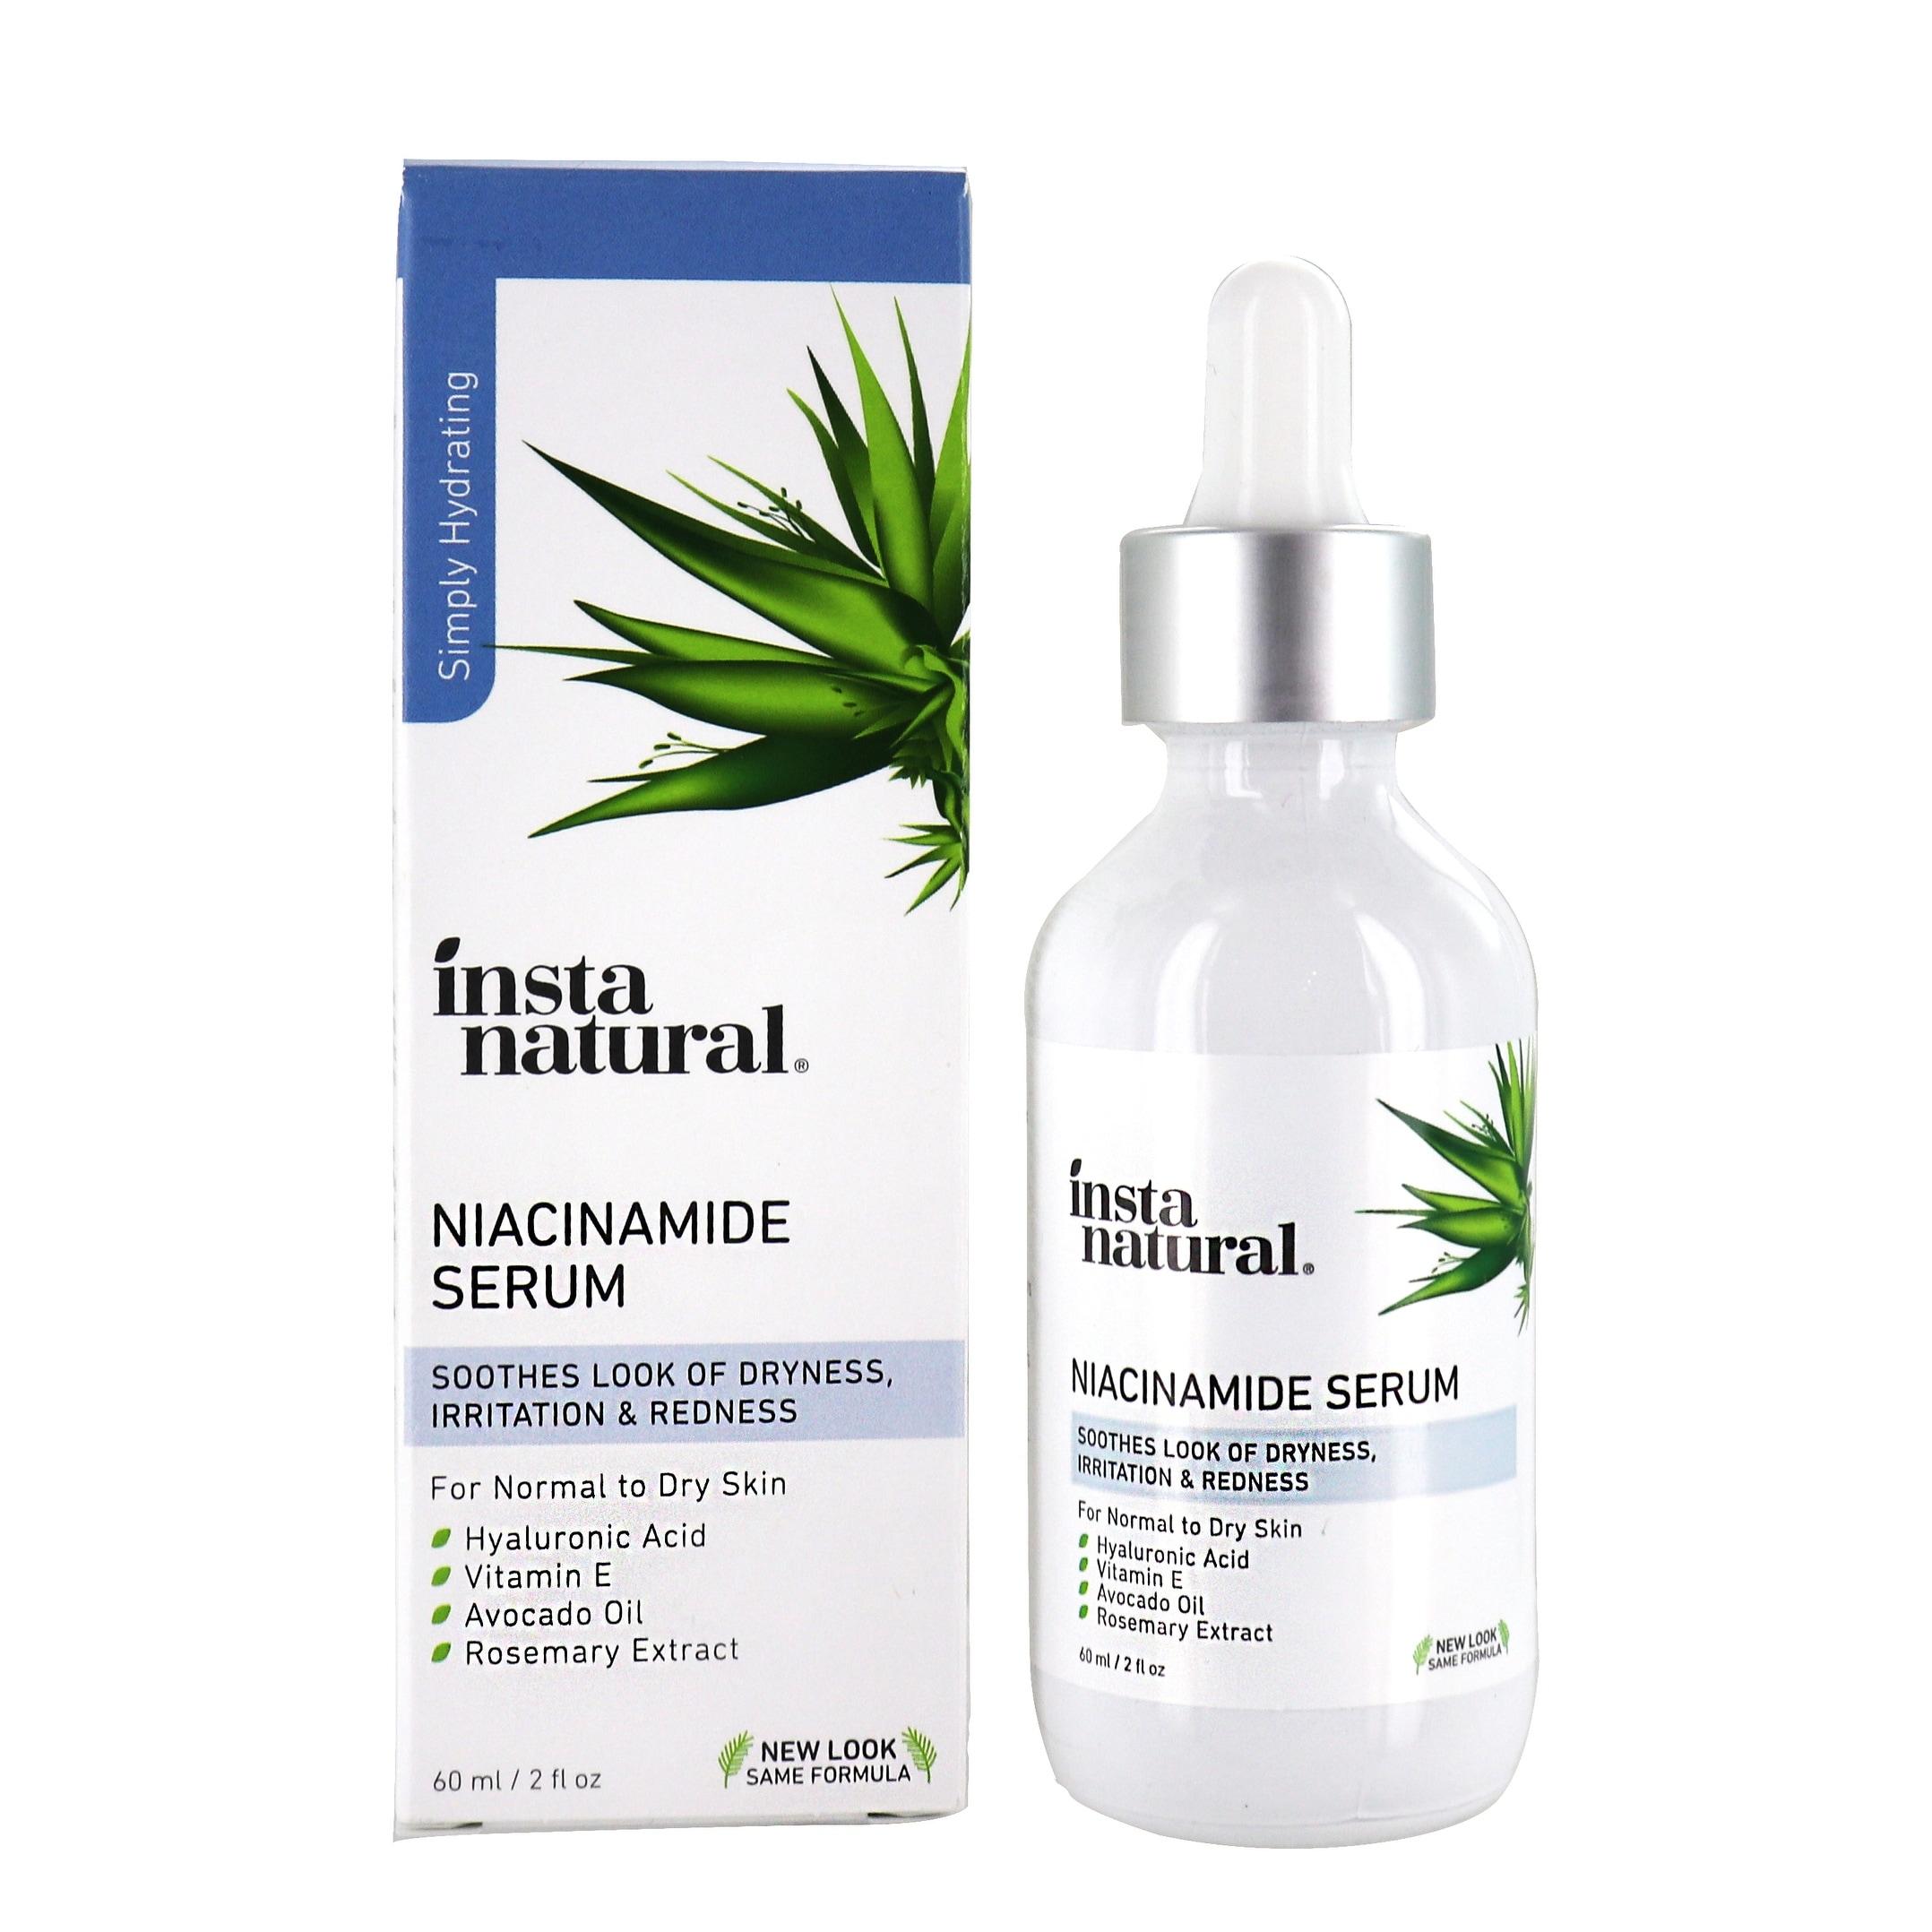 InstaNatural - Niacinamide Serum - 2 fl. oz.